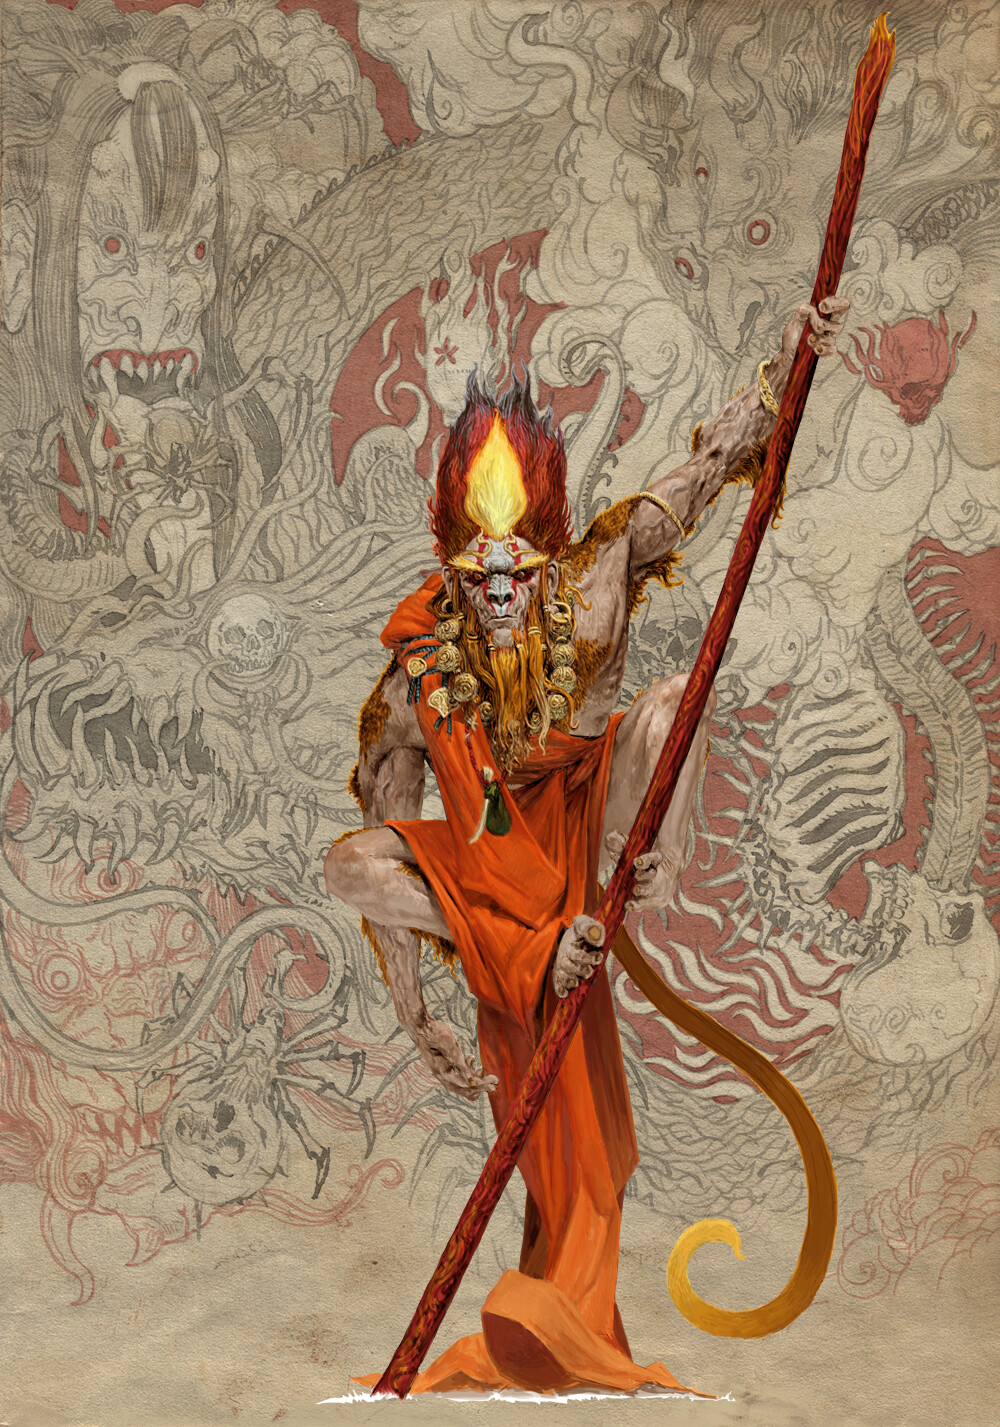 Adrian smith monster demon spirit kani monkey